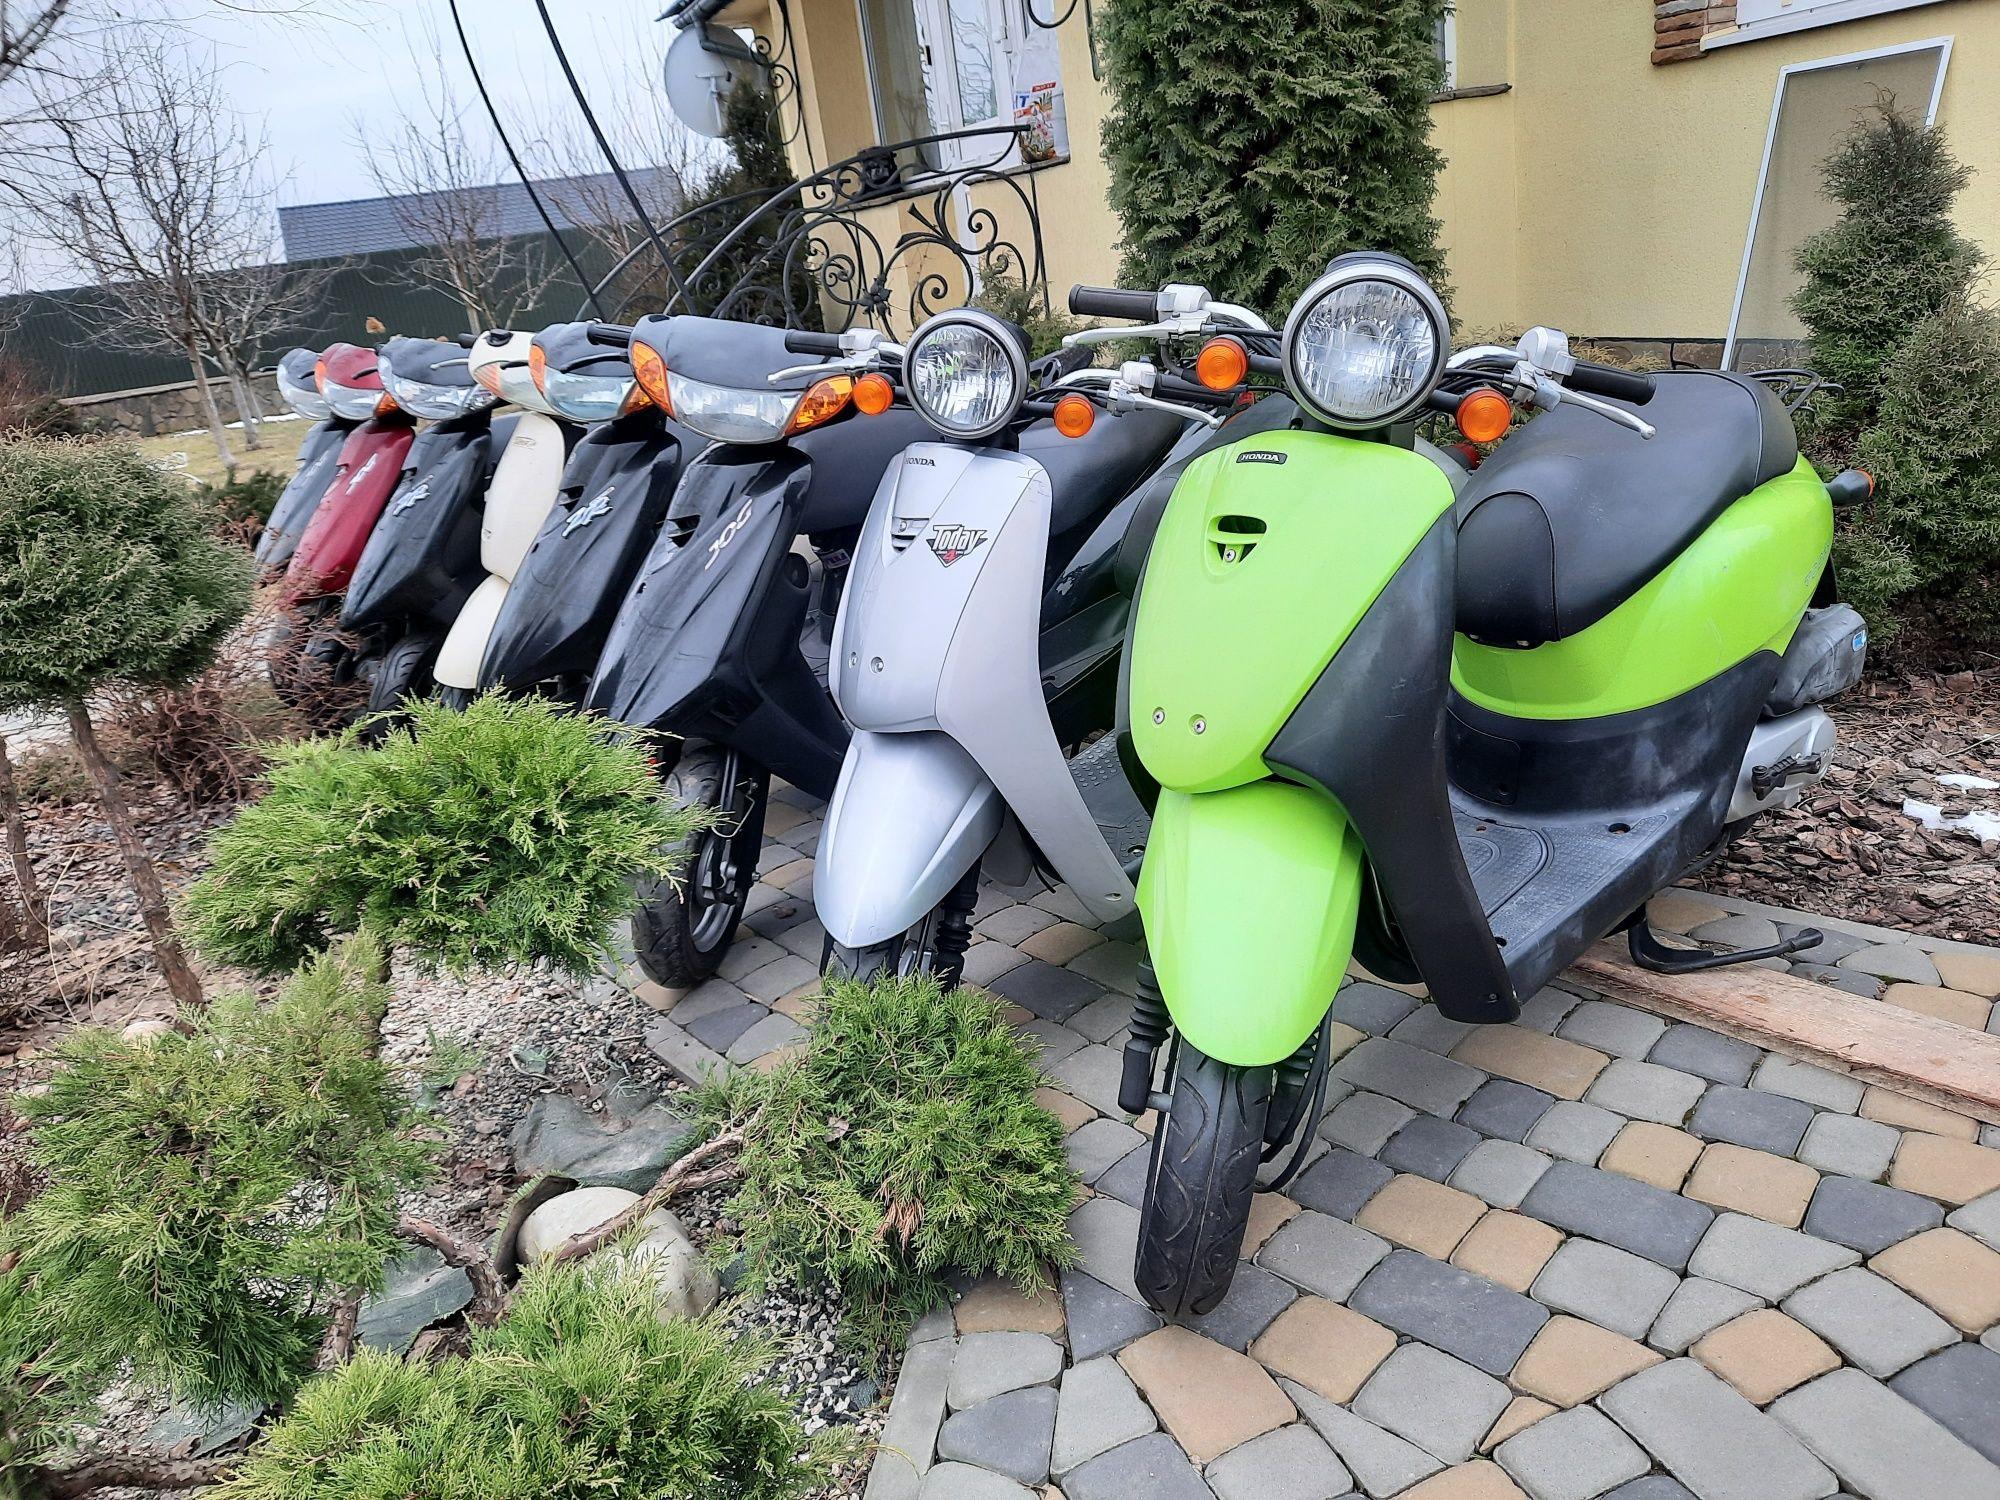 Продам скутера Хонда Діо, Ямаха, Сузукі